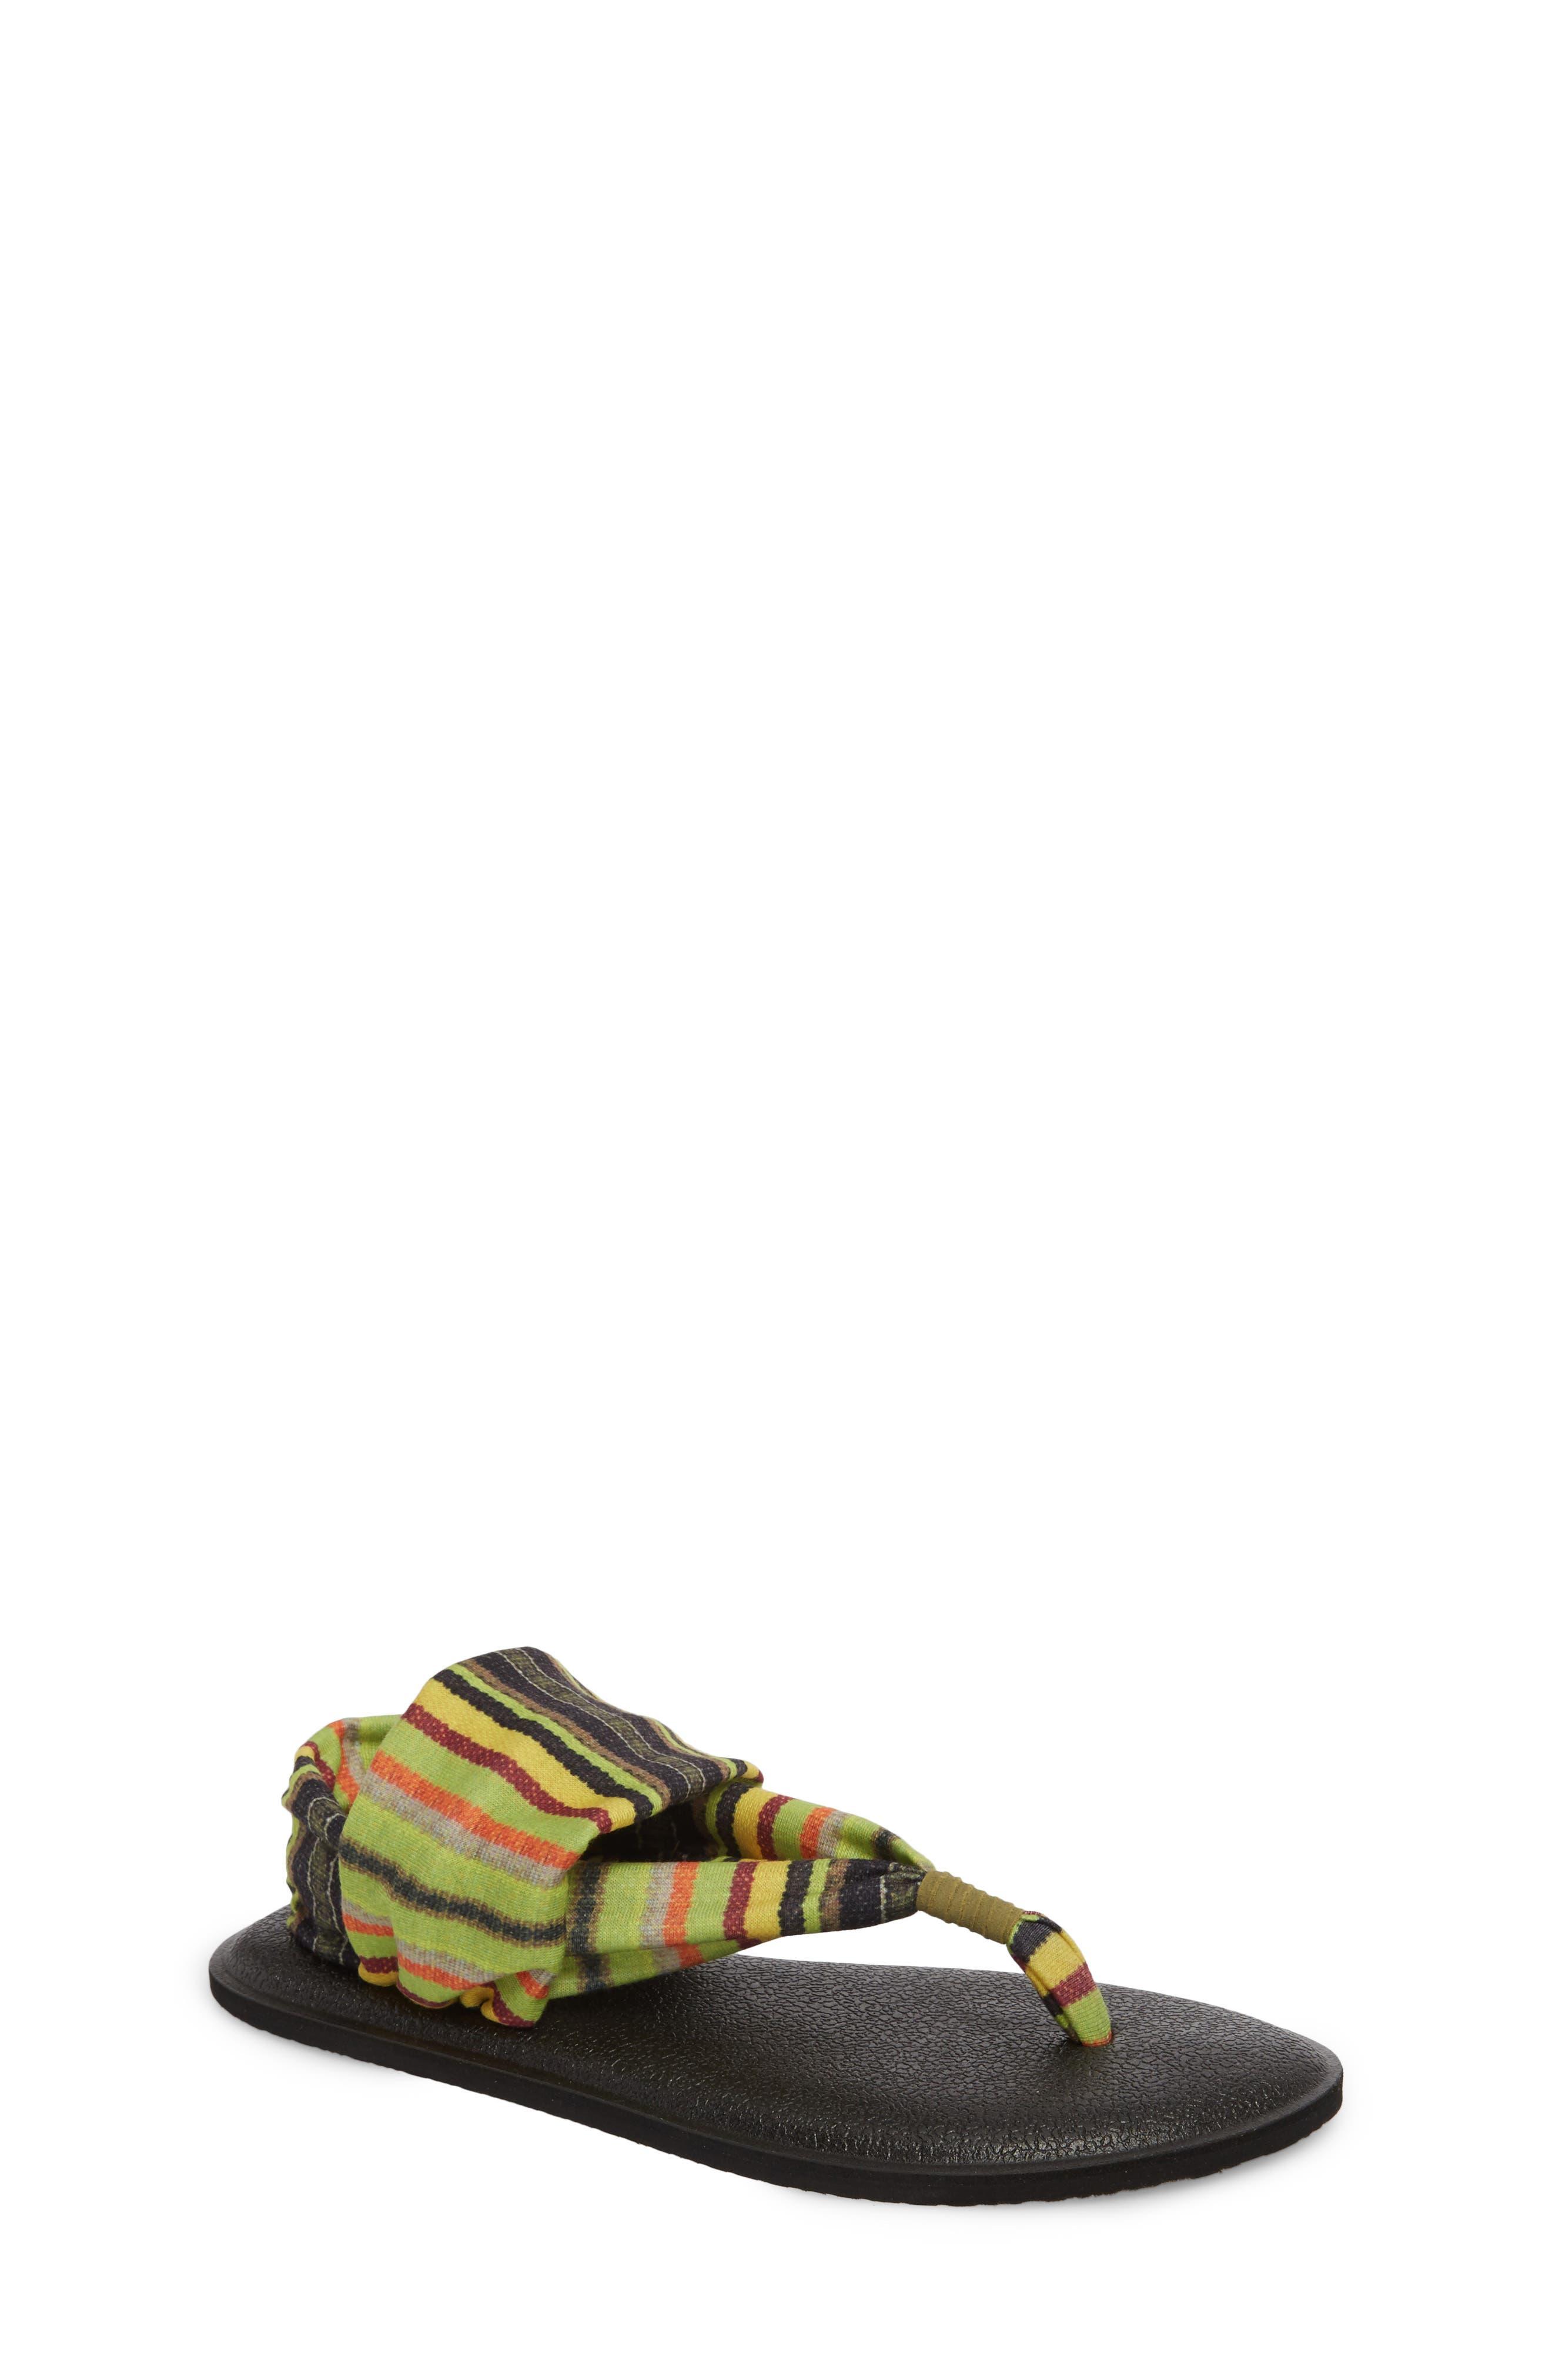 Main Image - Sanuk Yoga Sling Burst Sandal (Toddler, Little Kid & Big Kid)